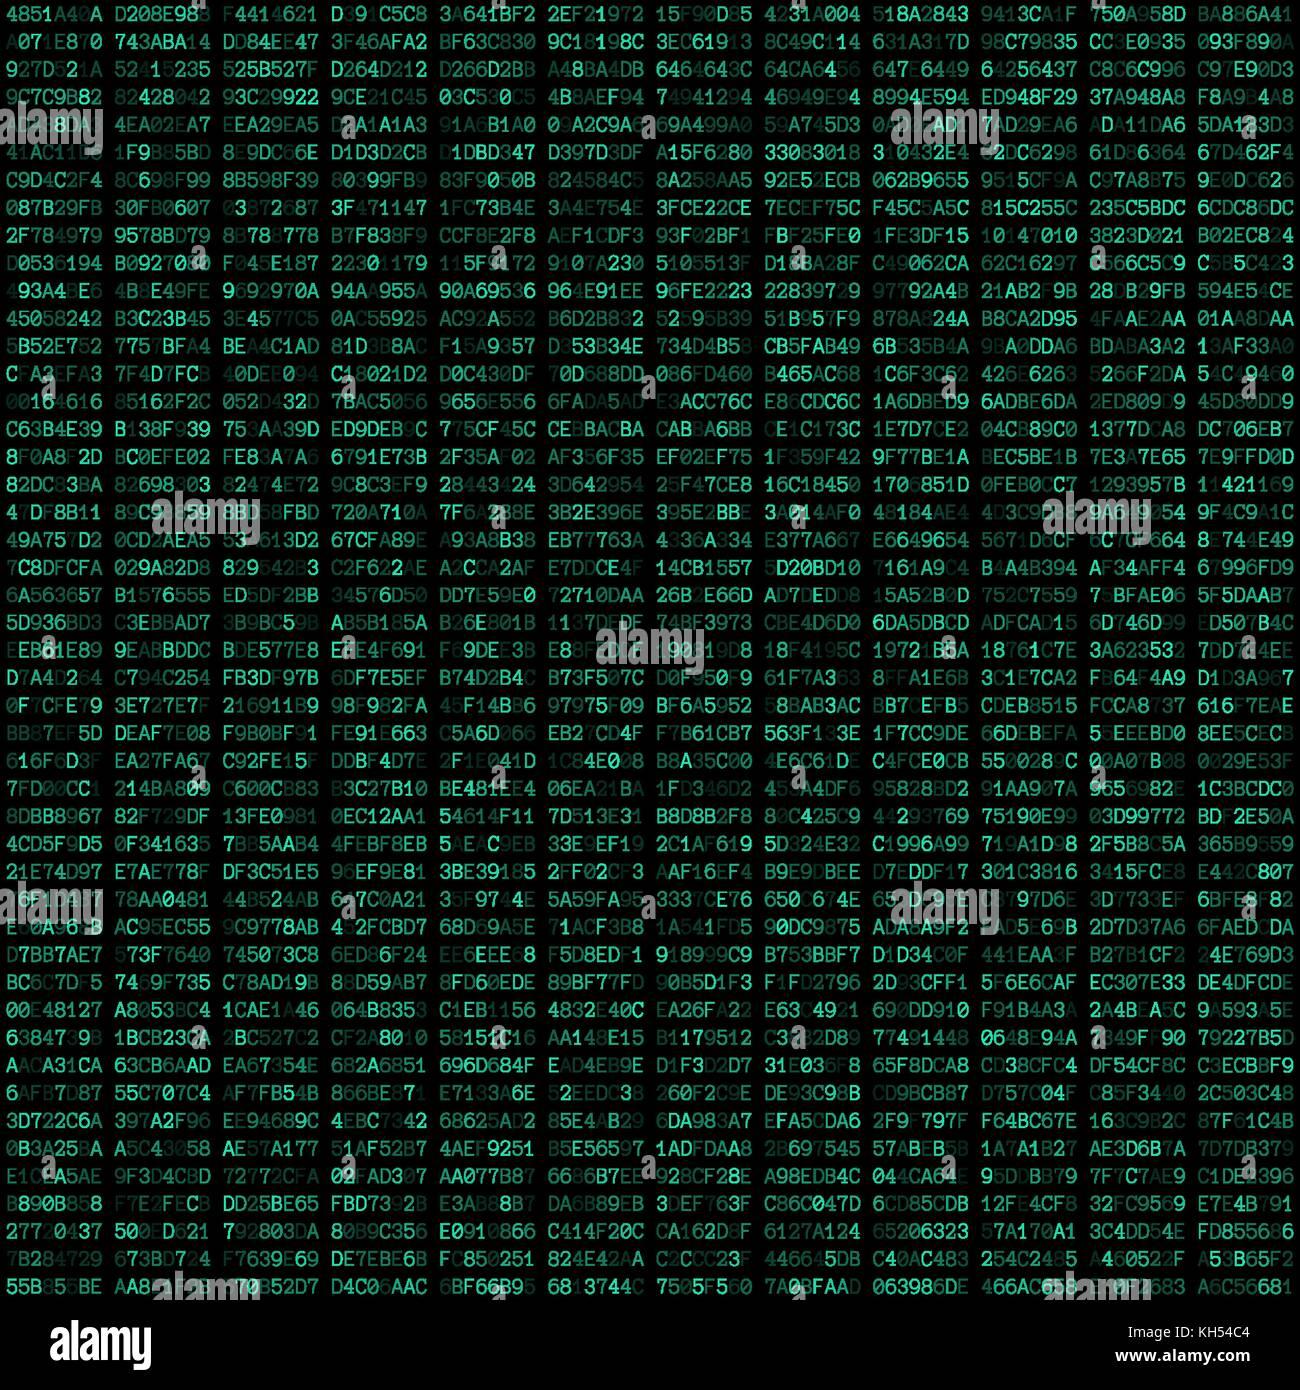 Color Hexa D24600 Page 4: Hexadecimal Color Code Stock Photos & Hexadecimal Color Code Stock Images